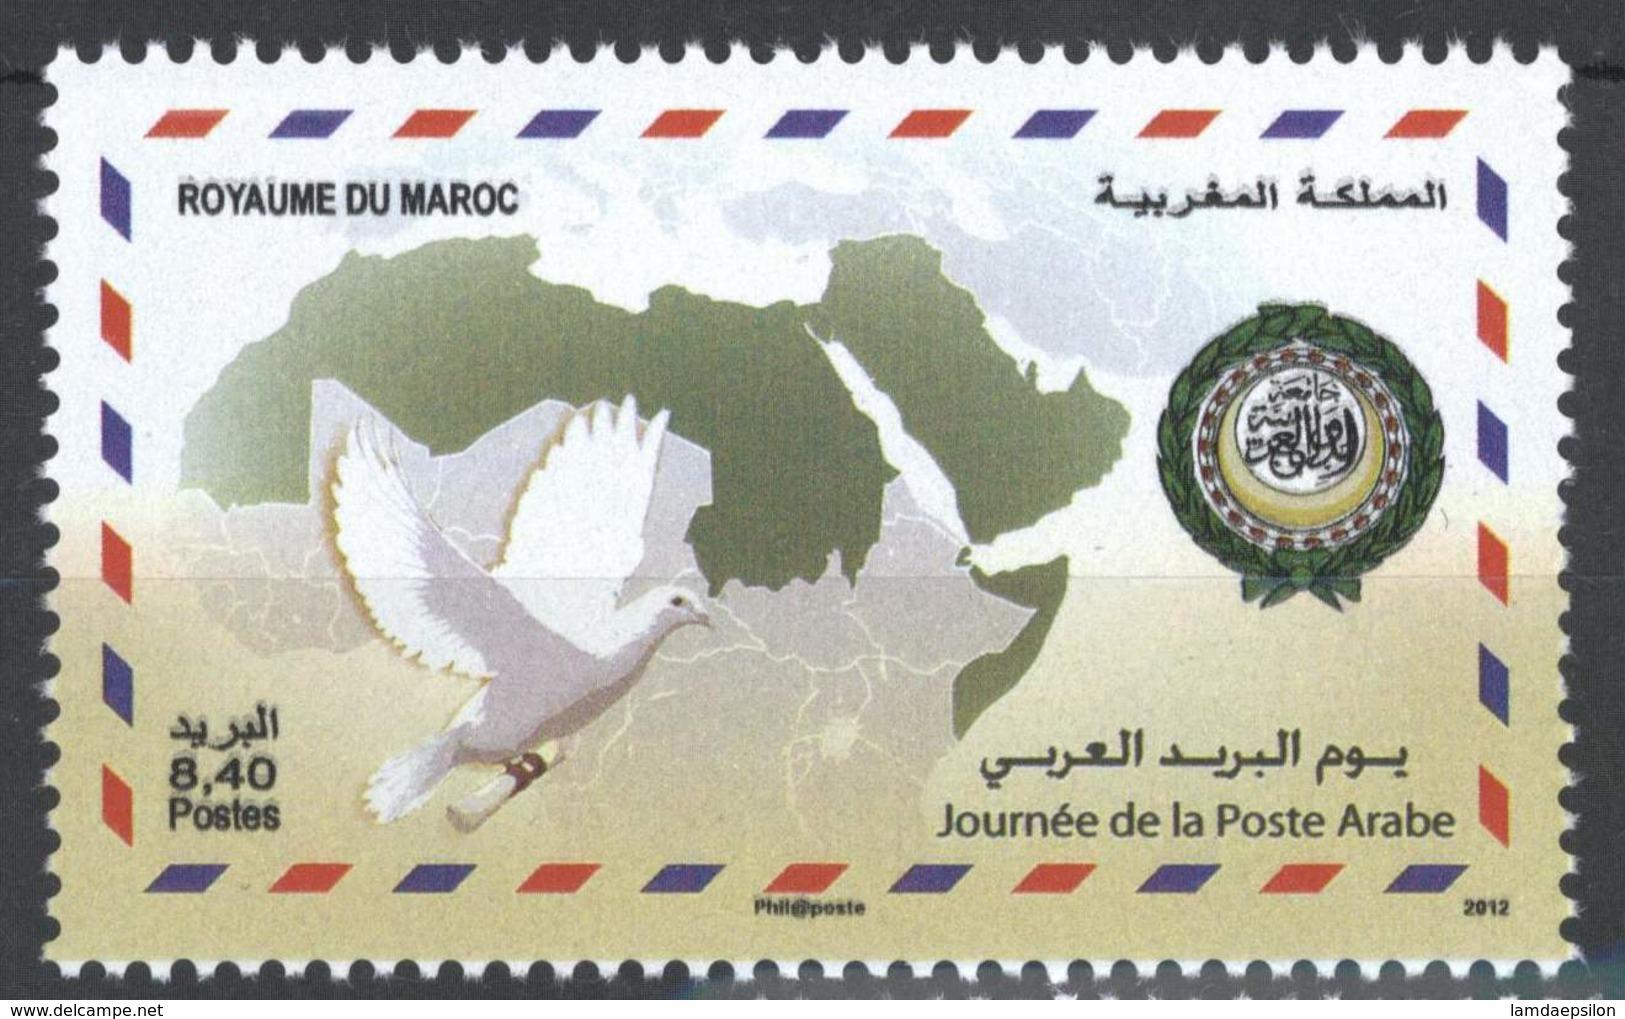 MOROCCO JOURNEE TIMBRE ARABE 2012 - Morocco (1956-...)